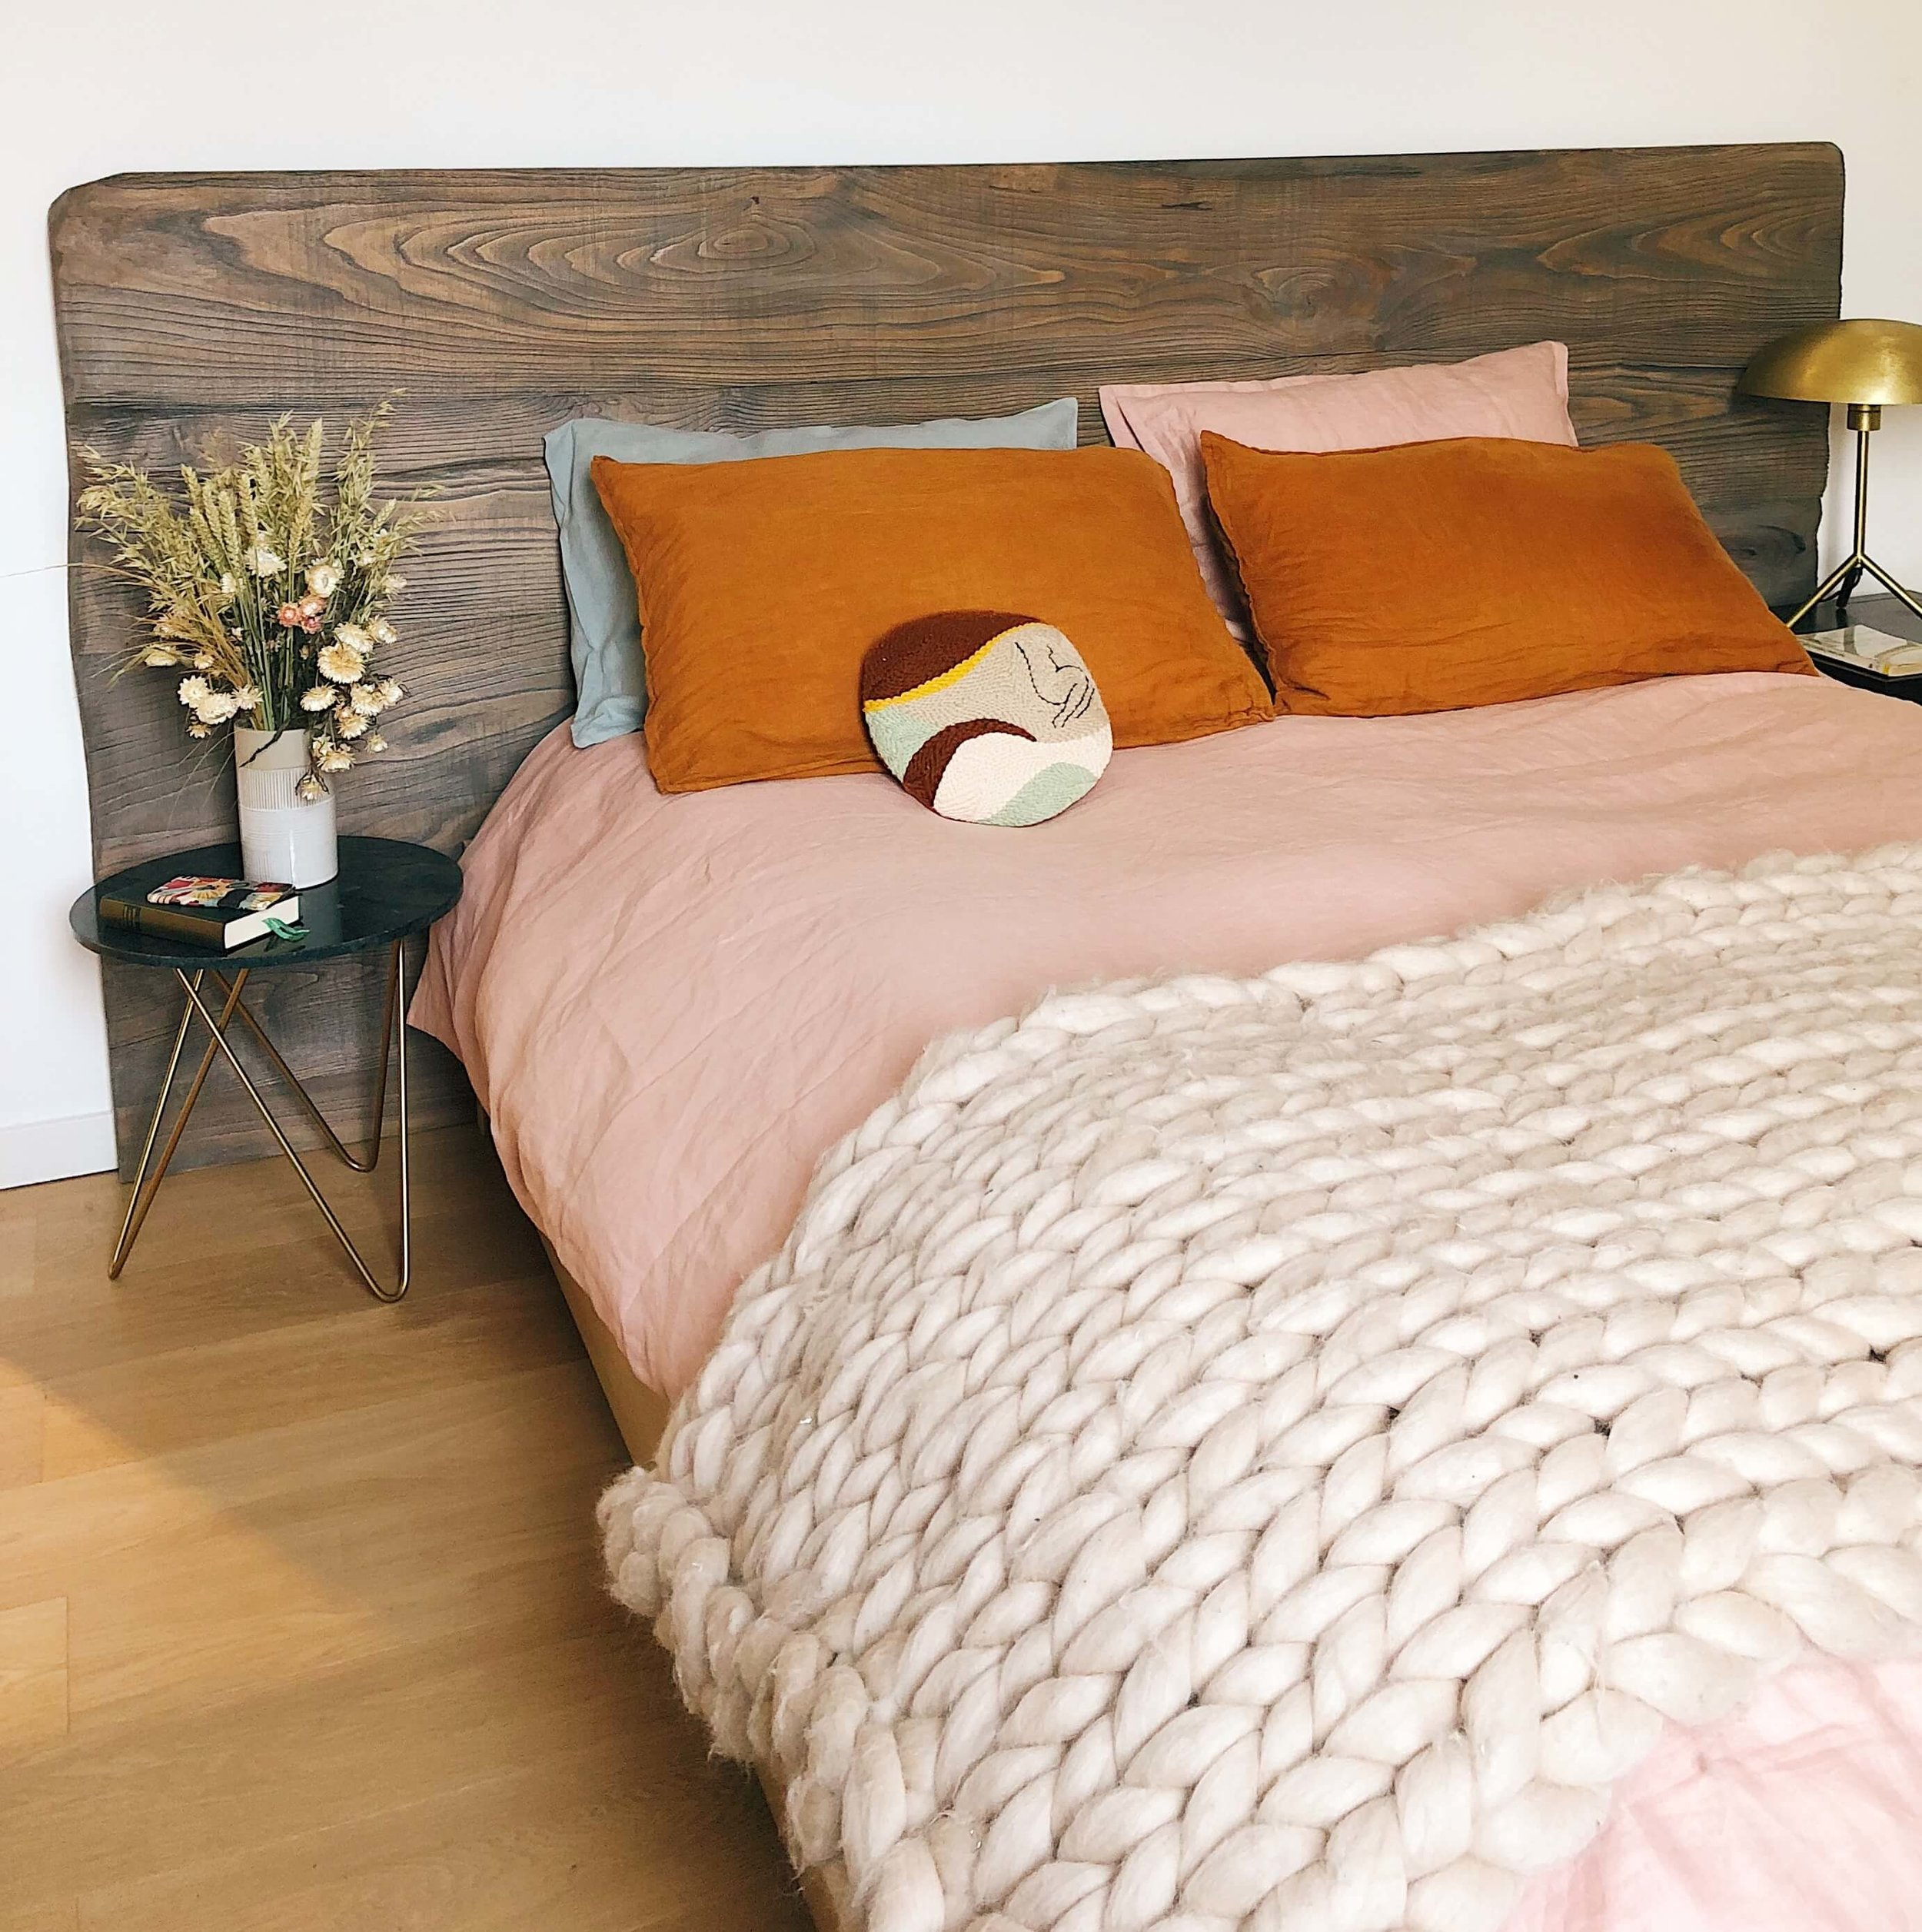 introverted-mom-bedroom-jen-pollard-online-interiors-yasmine-boheas-PX7hU0tcBL0-unsplash.jpg